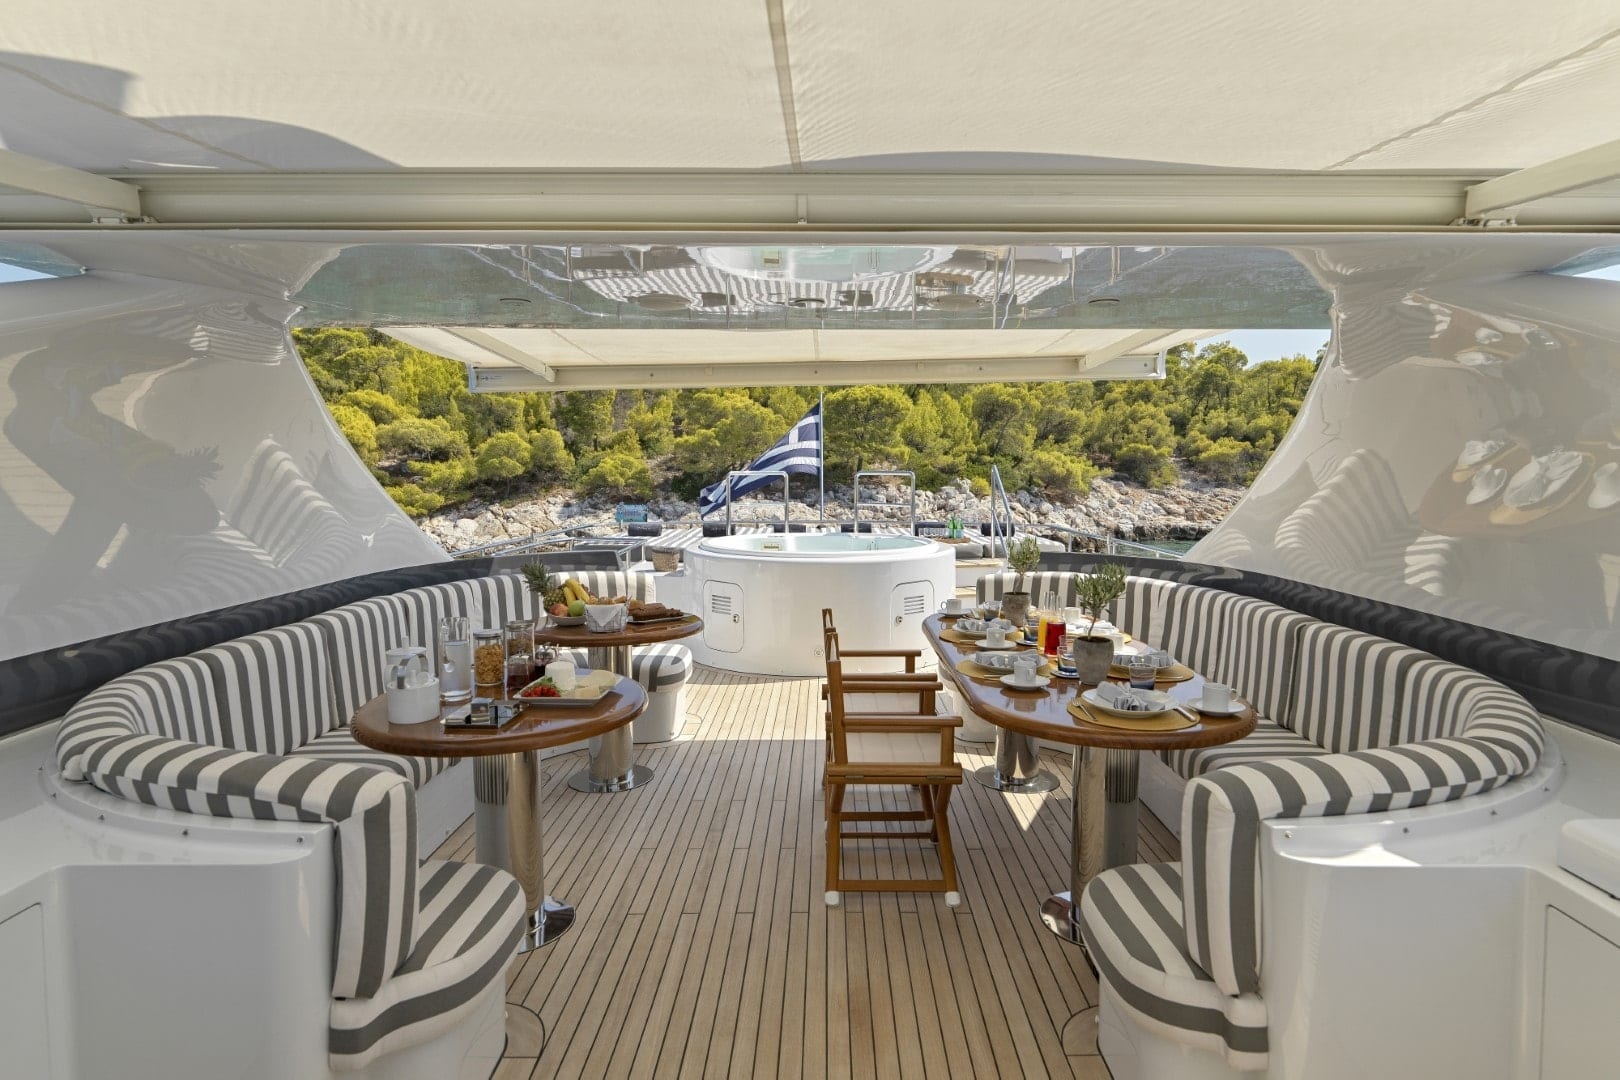 alma-motor-yacht-upper-deck (4)-min